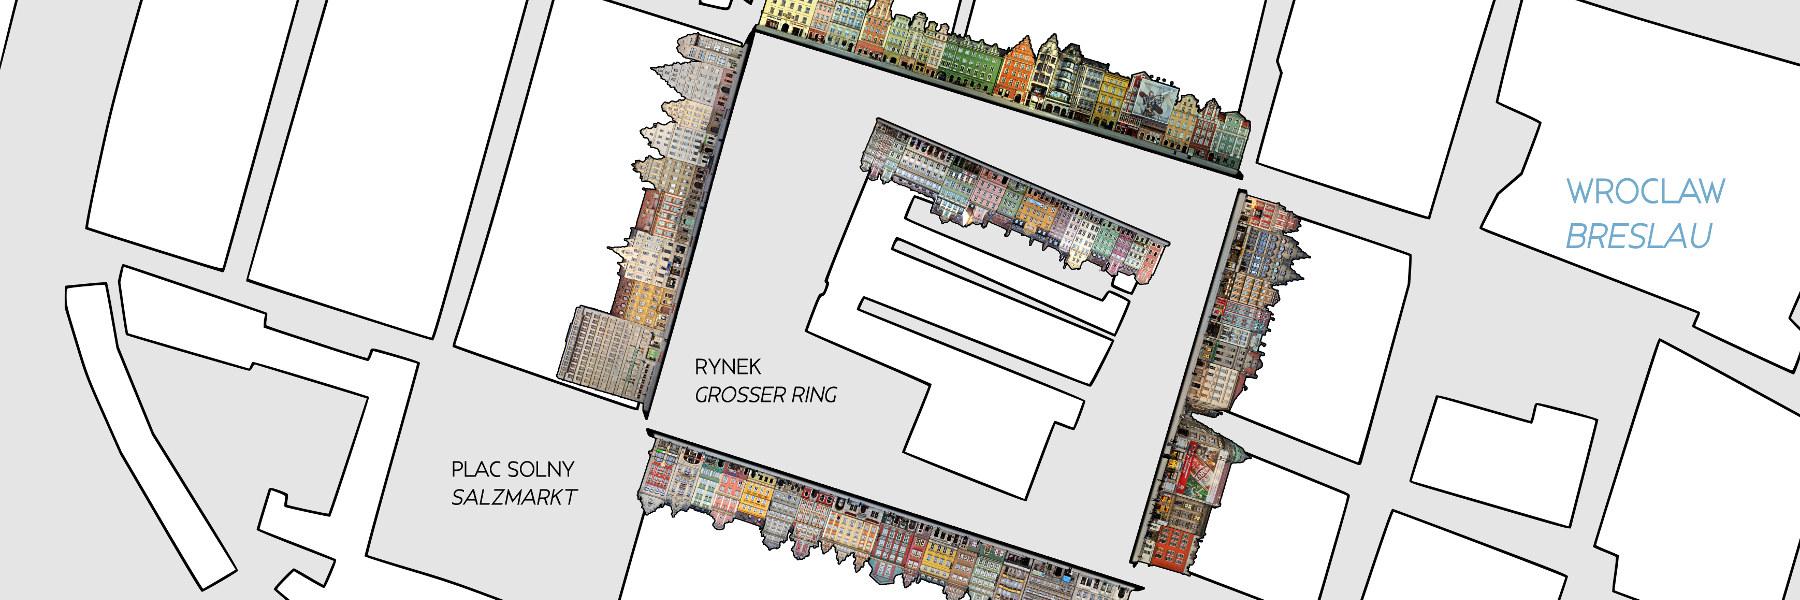 Stadtkarte Breslau Großer Ring Rynek